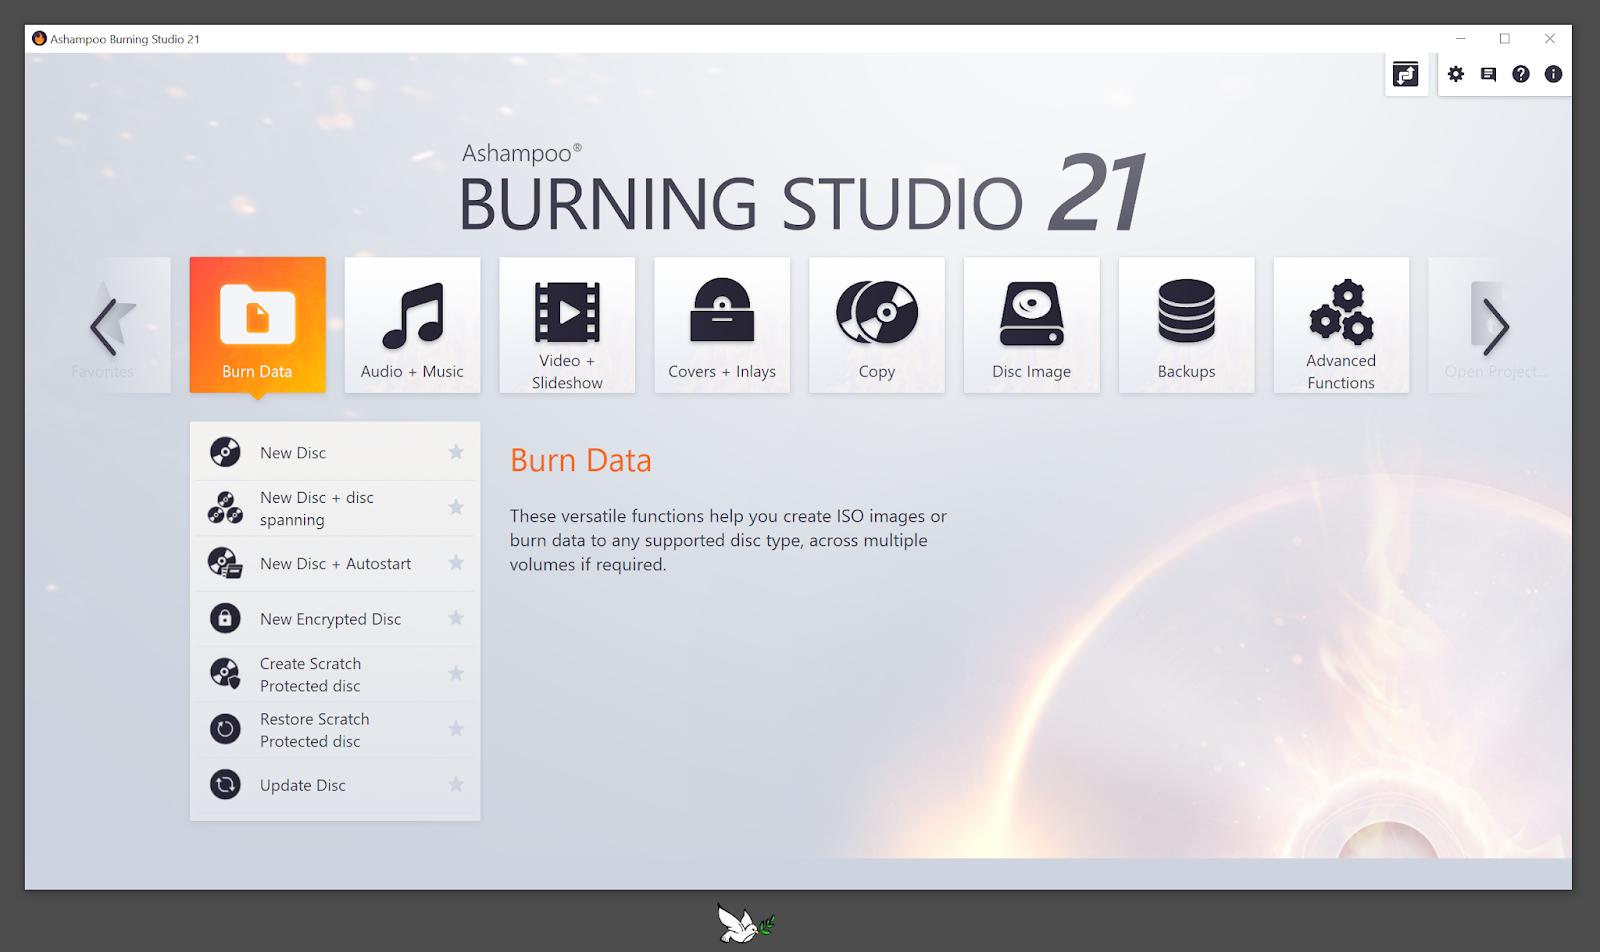 تحميل برنامج Ashampoo Burning Studio 21.0.0.33 كامل